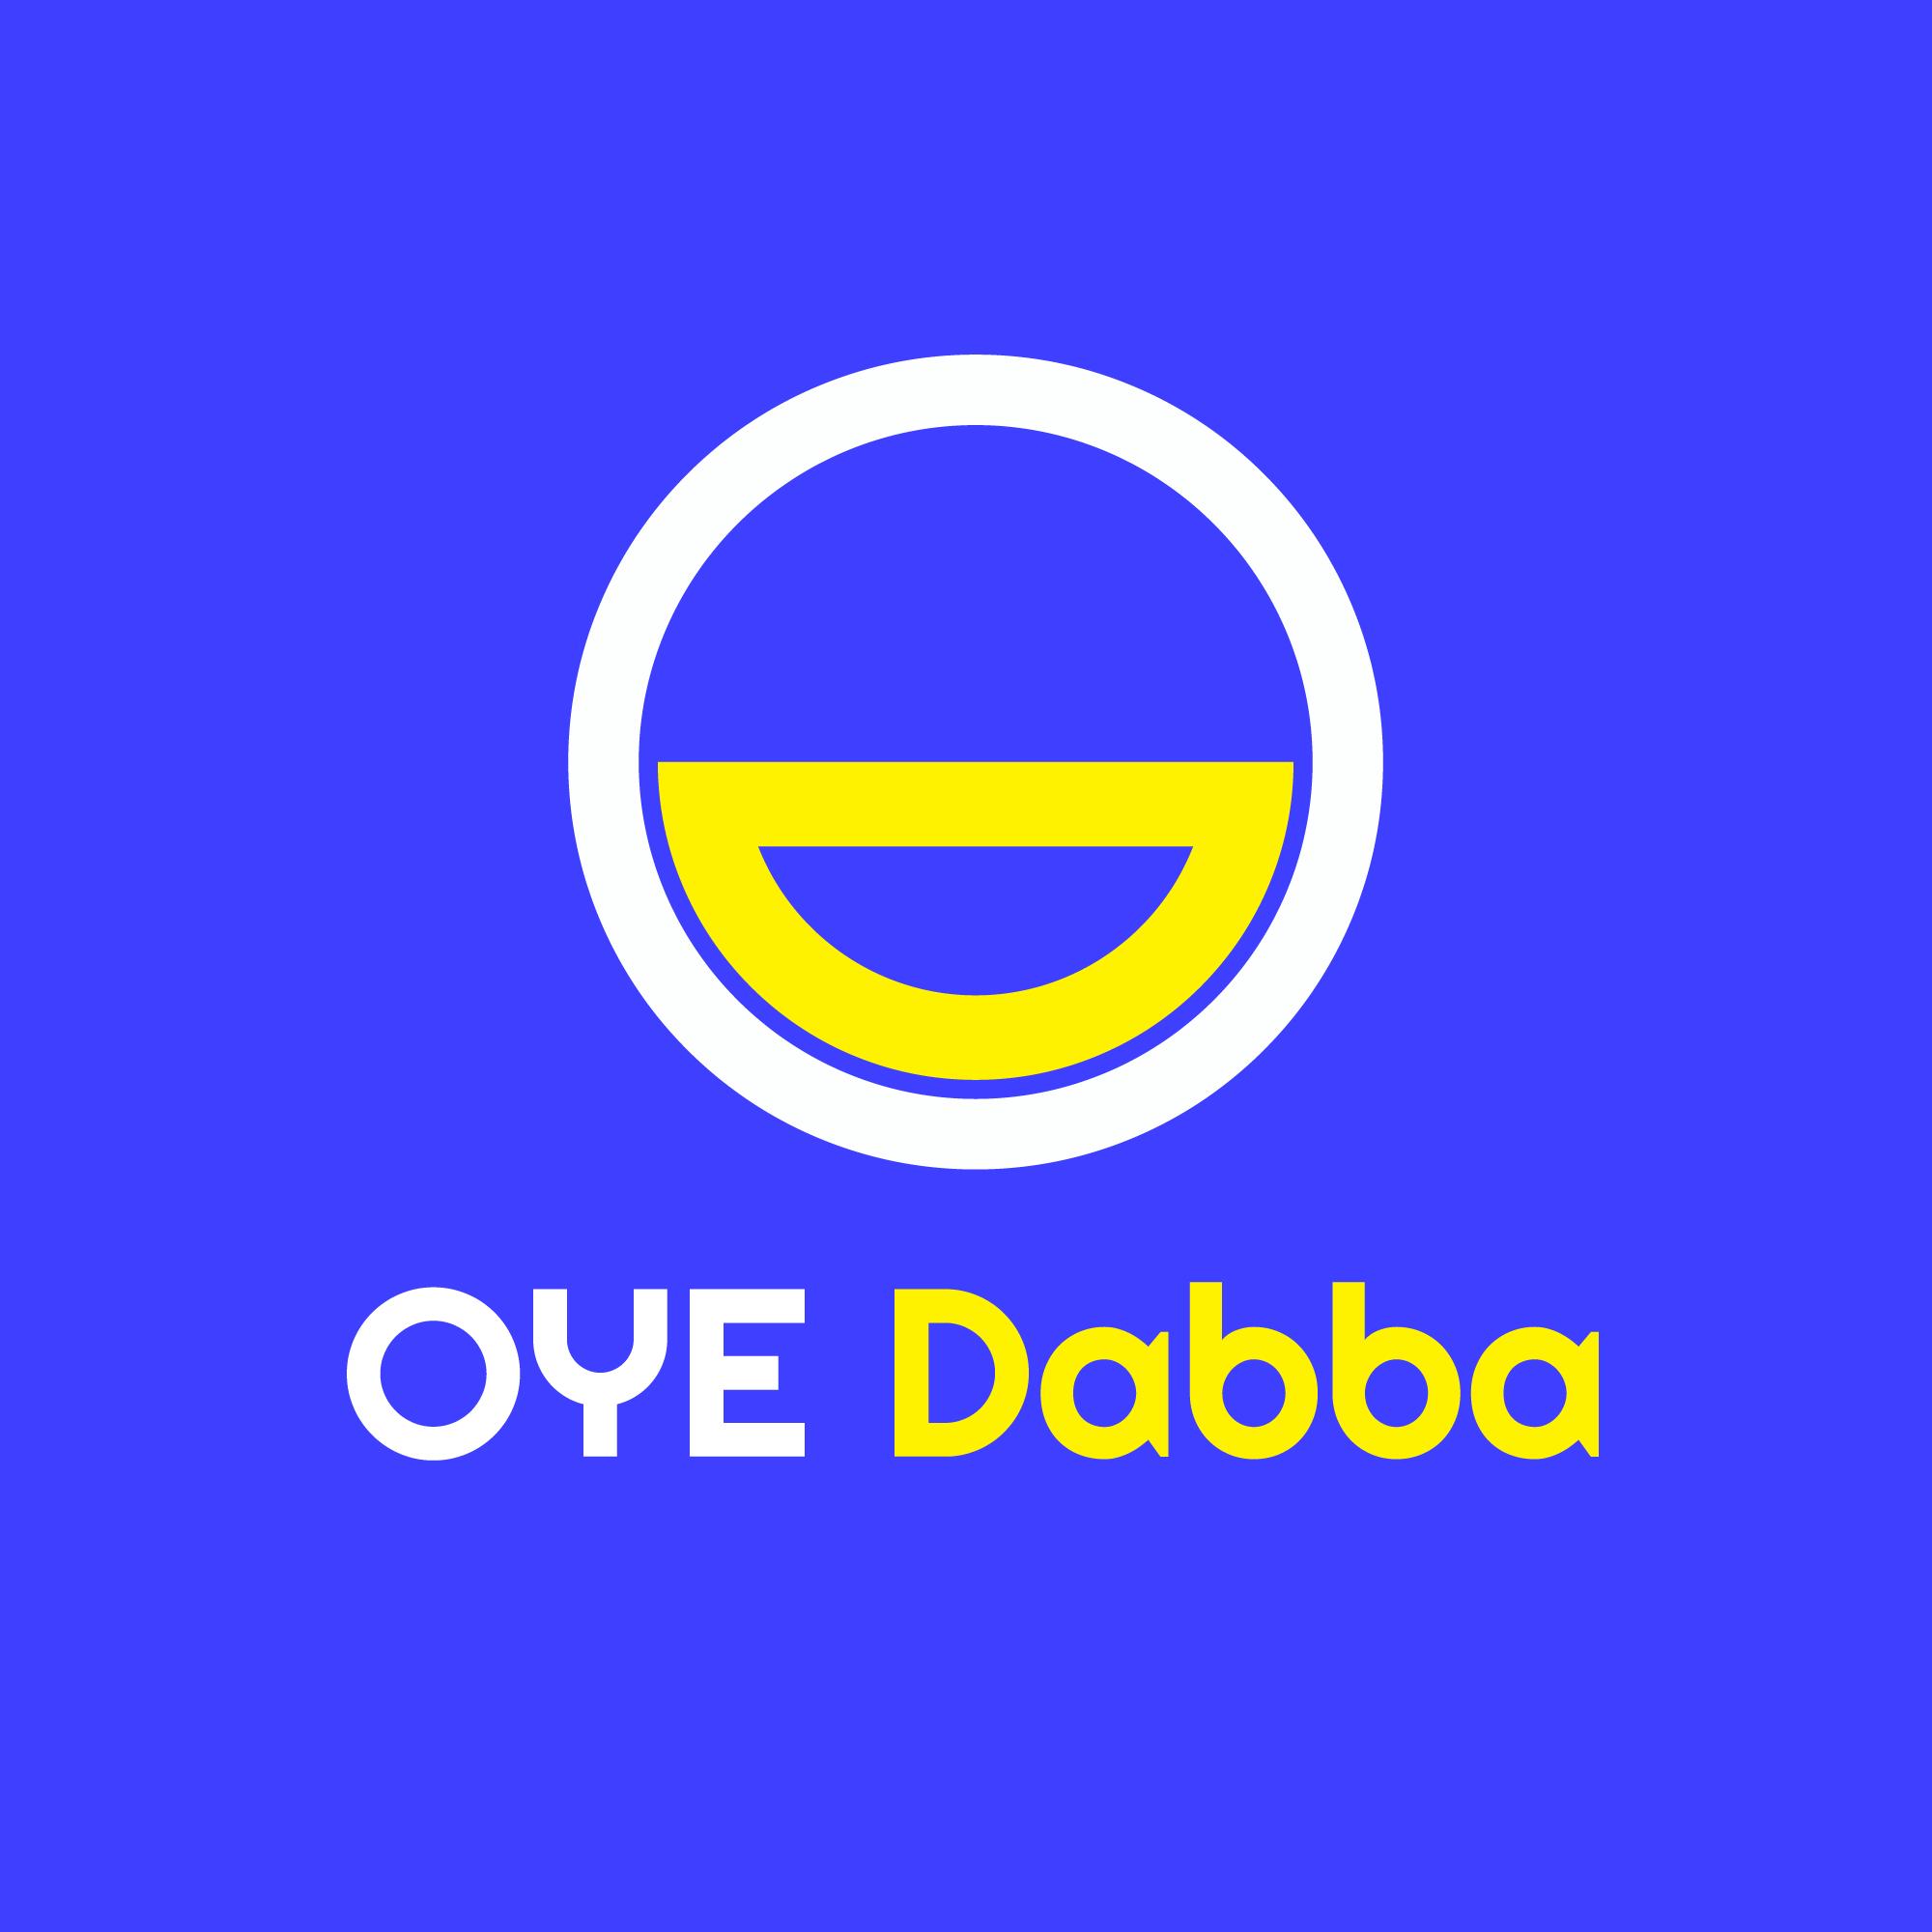 Oye Dabba